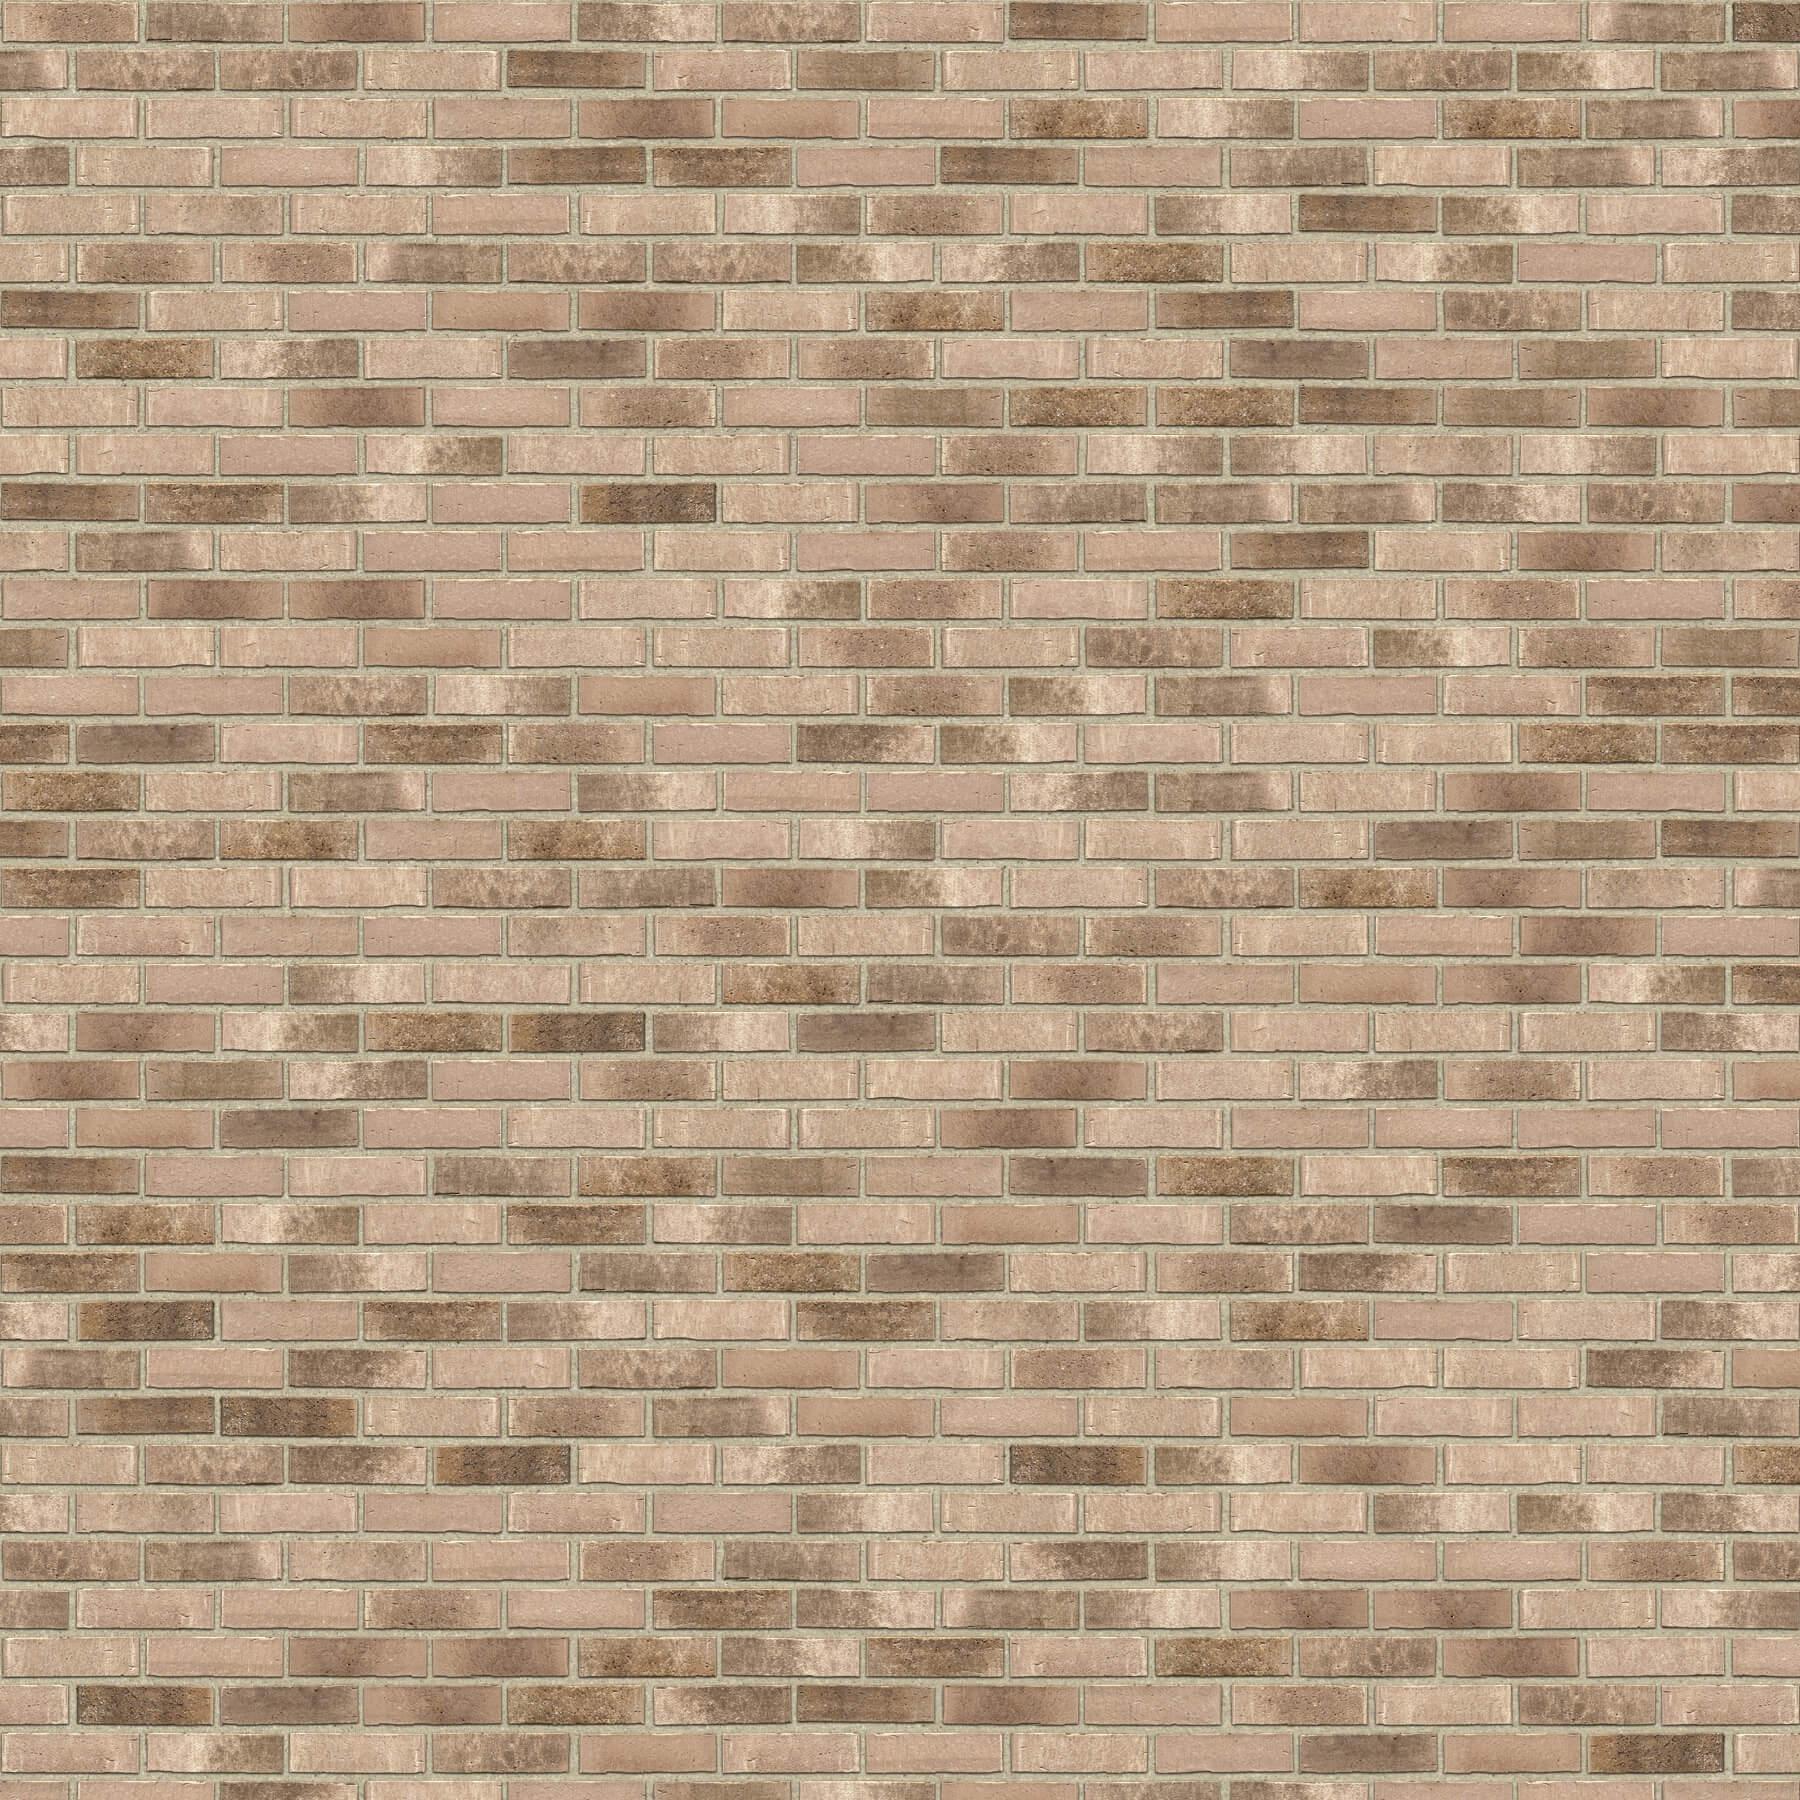 Puna-cigla-FeldHaus-Klinker-brick-house-beograd-nf-k-773-Bez Fuga